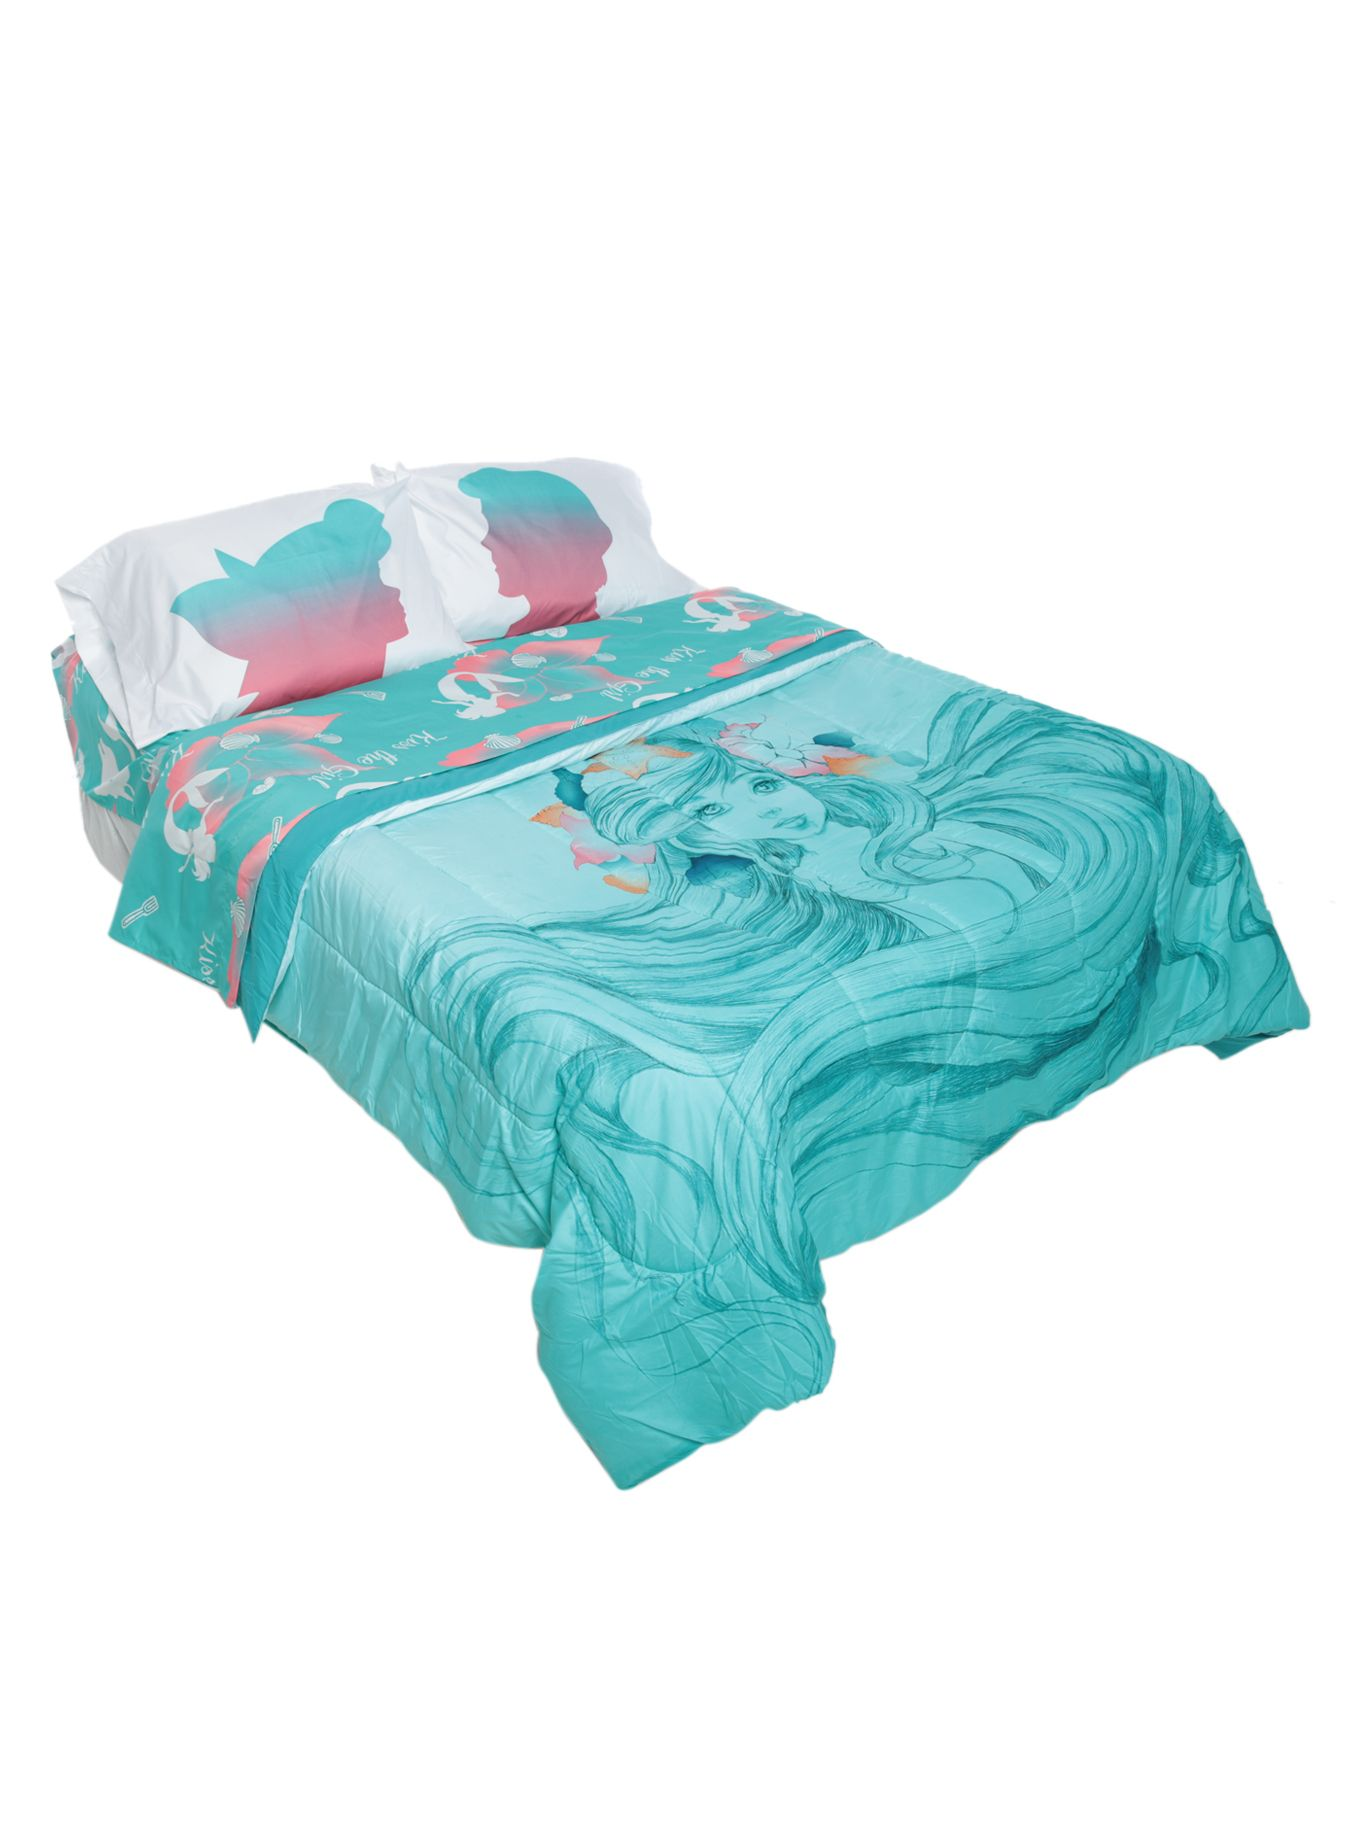 Disney The Little Mermaid Sketch Full Queen Comforter Hot Topic Omgggggg T Yessssss